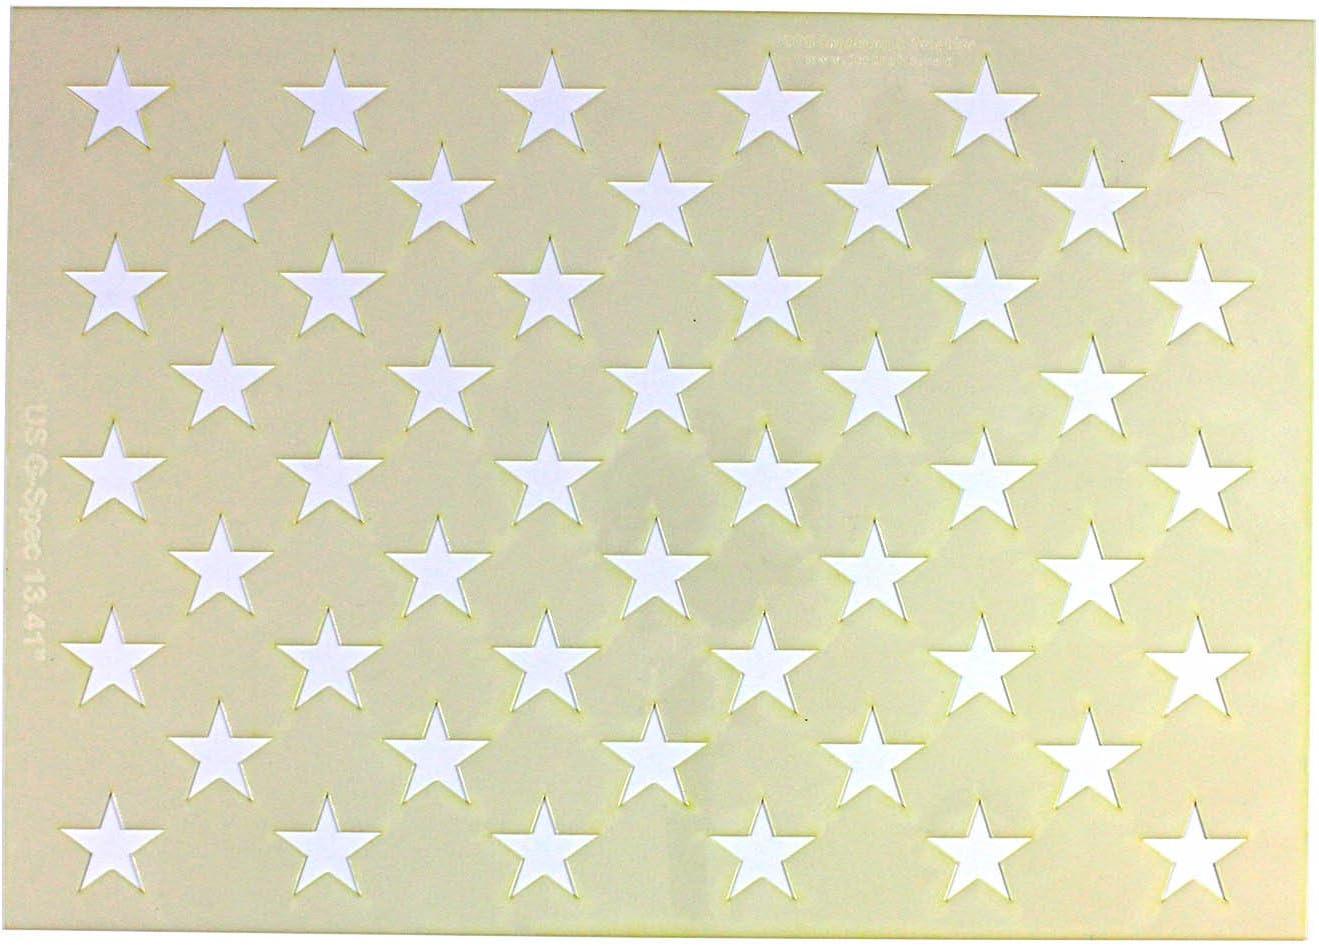 50 Star Field Stencil US//American Flag G-Spec 9.5 x 13.41 Inches